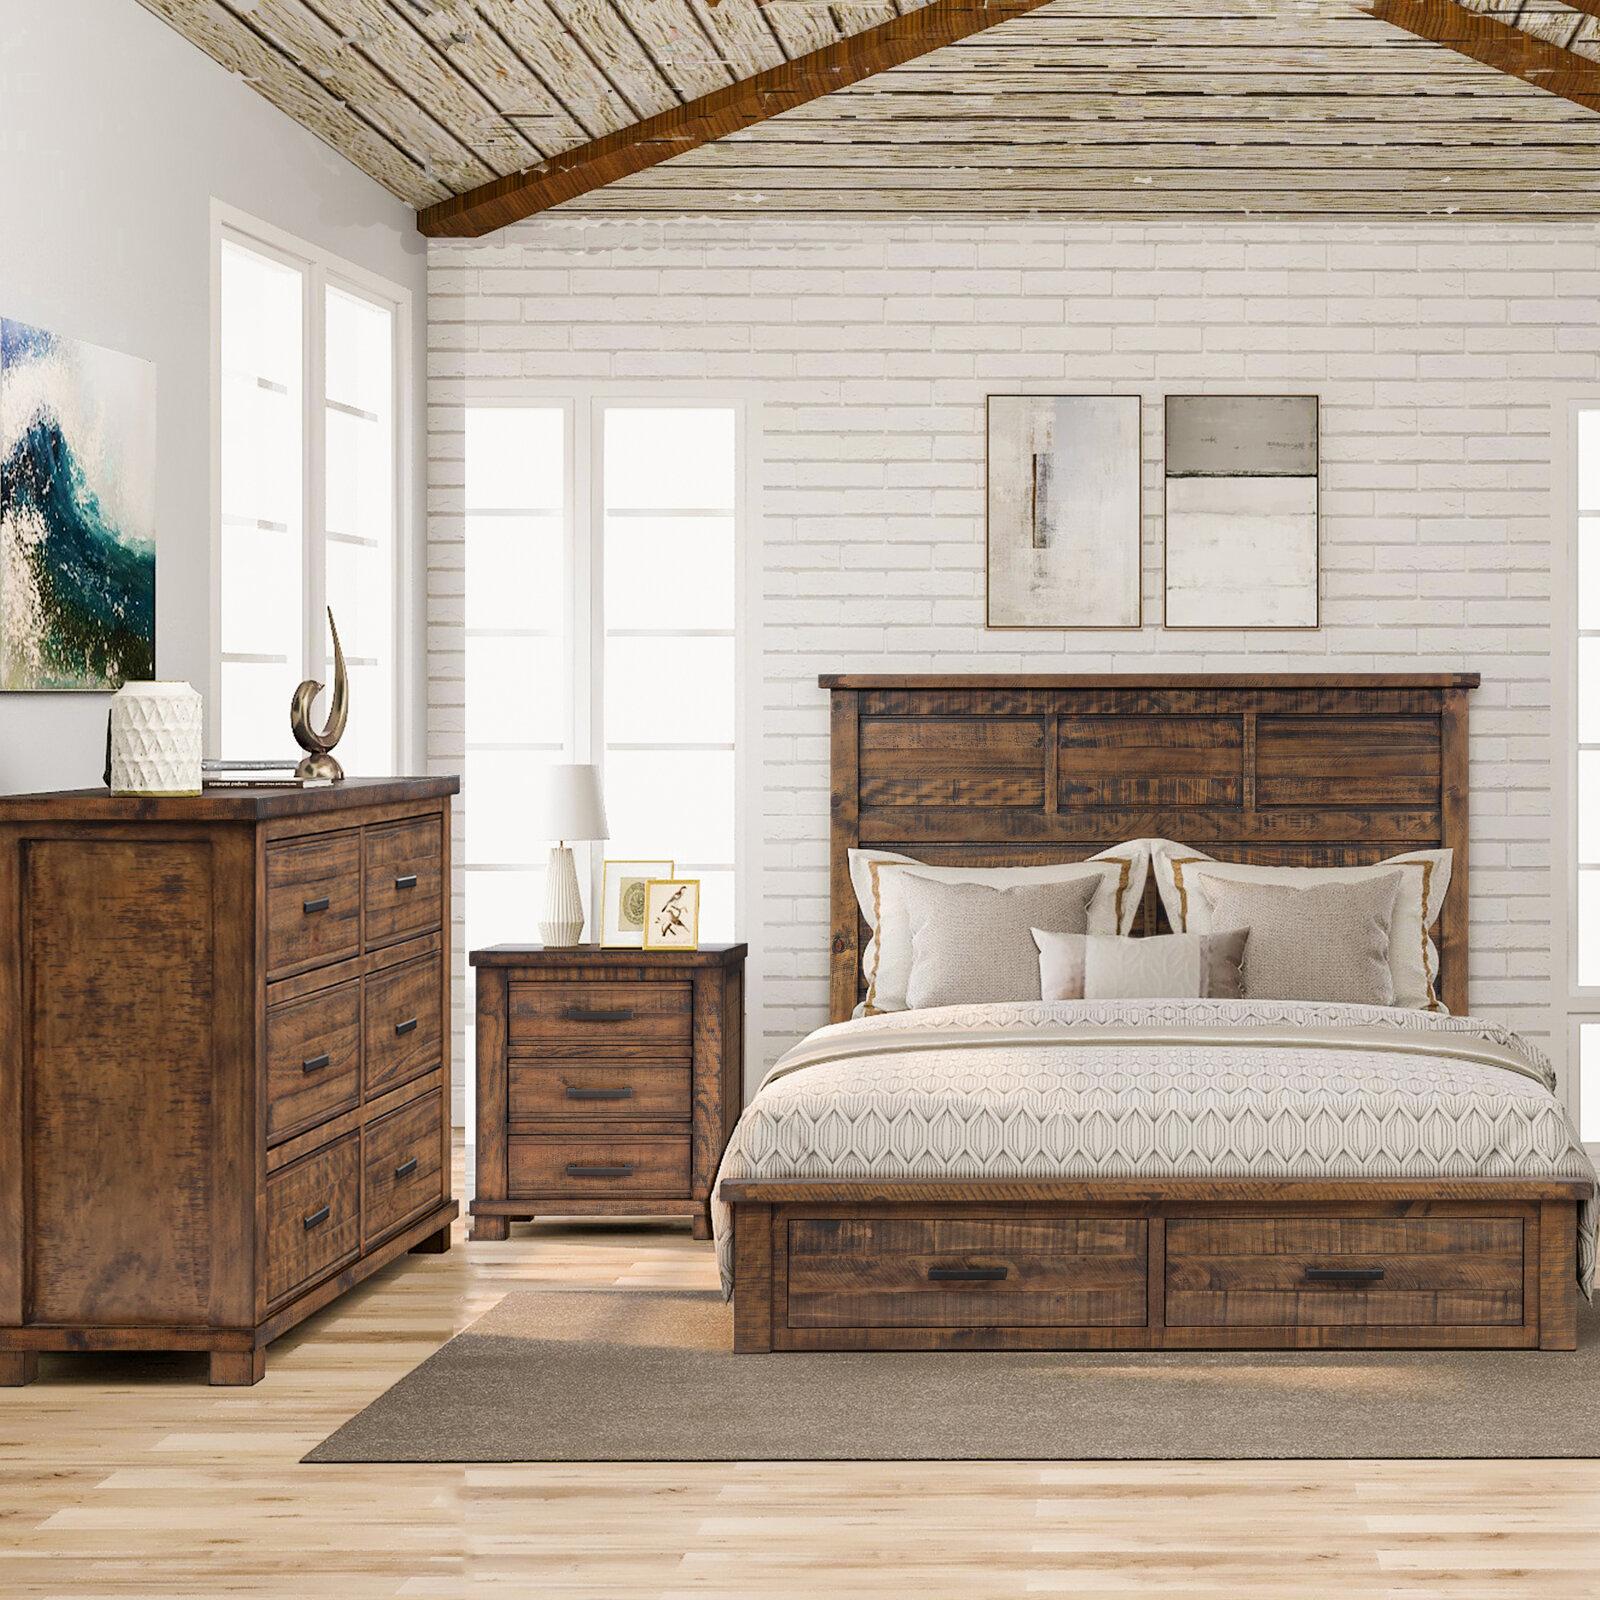 3 Drawers Nightstands And 6 Drawer Dresser Include Solid Pine Wood Storage Bed Softsea 3 Piece Reclaimed Wood Queen Bedroom Furniture Set Bedroom Sets Home Kitchen Florent Dejardin Fr